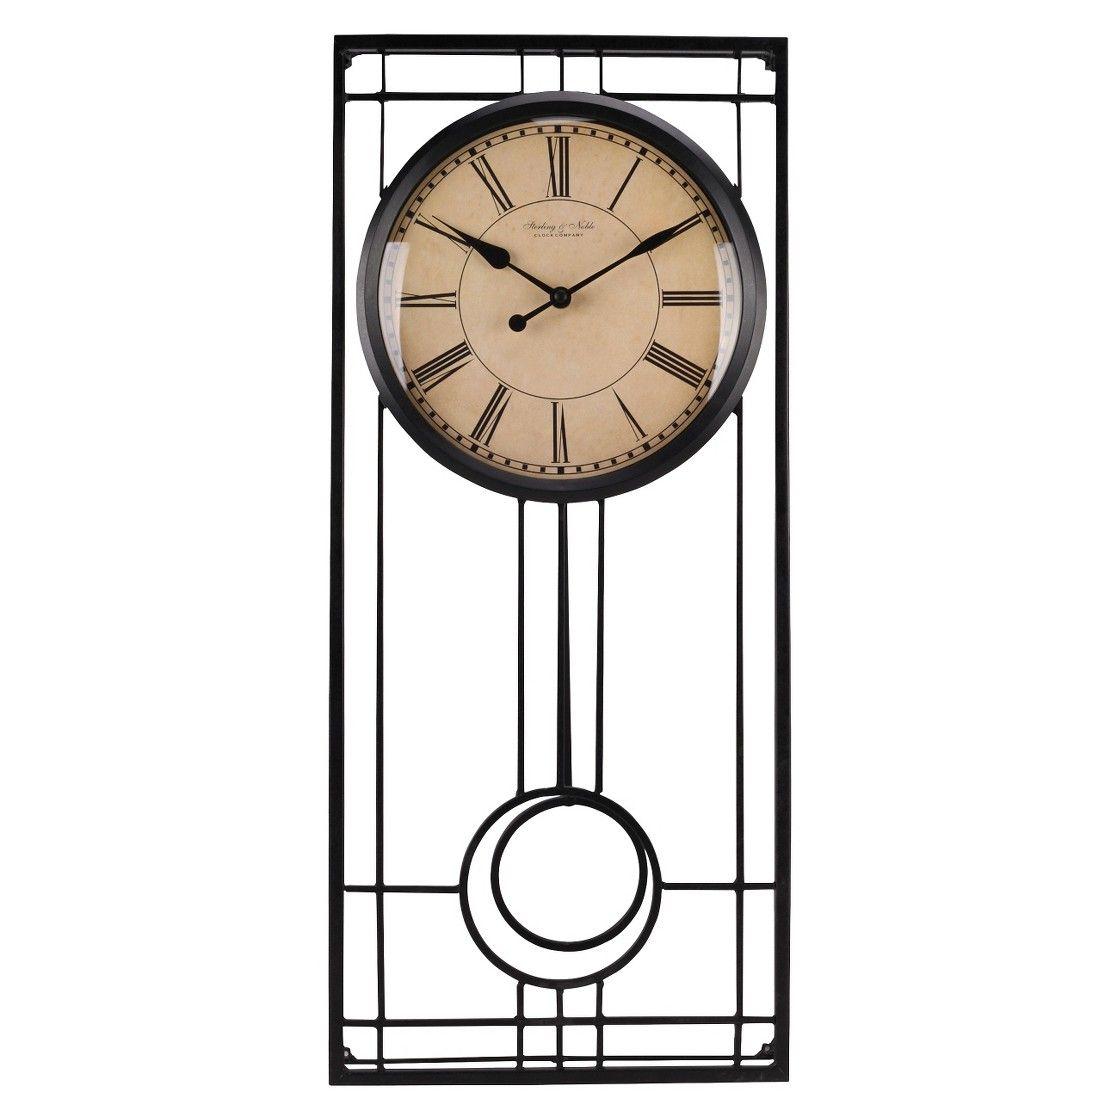 Threshold Pendulum Wall Clock Wall Clock Pendulum Wall Clock Traditional Wall Clocks